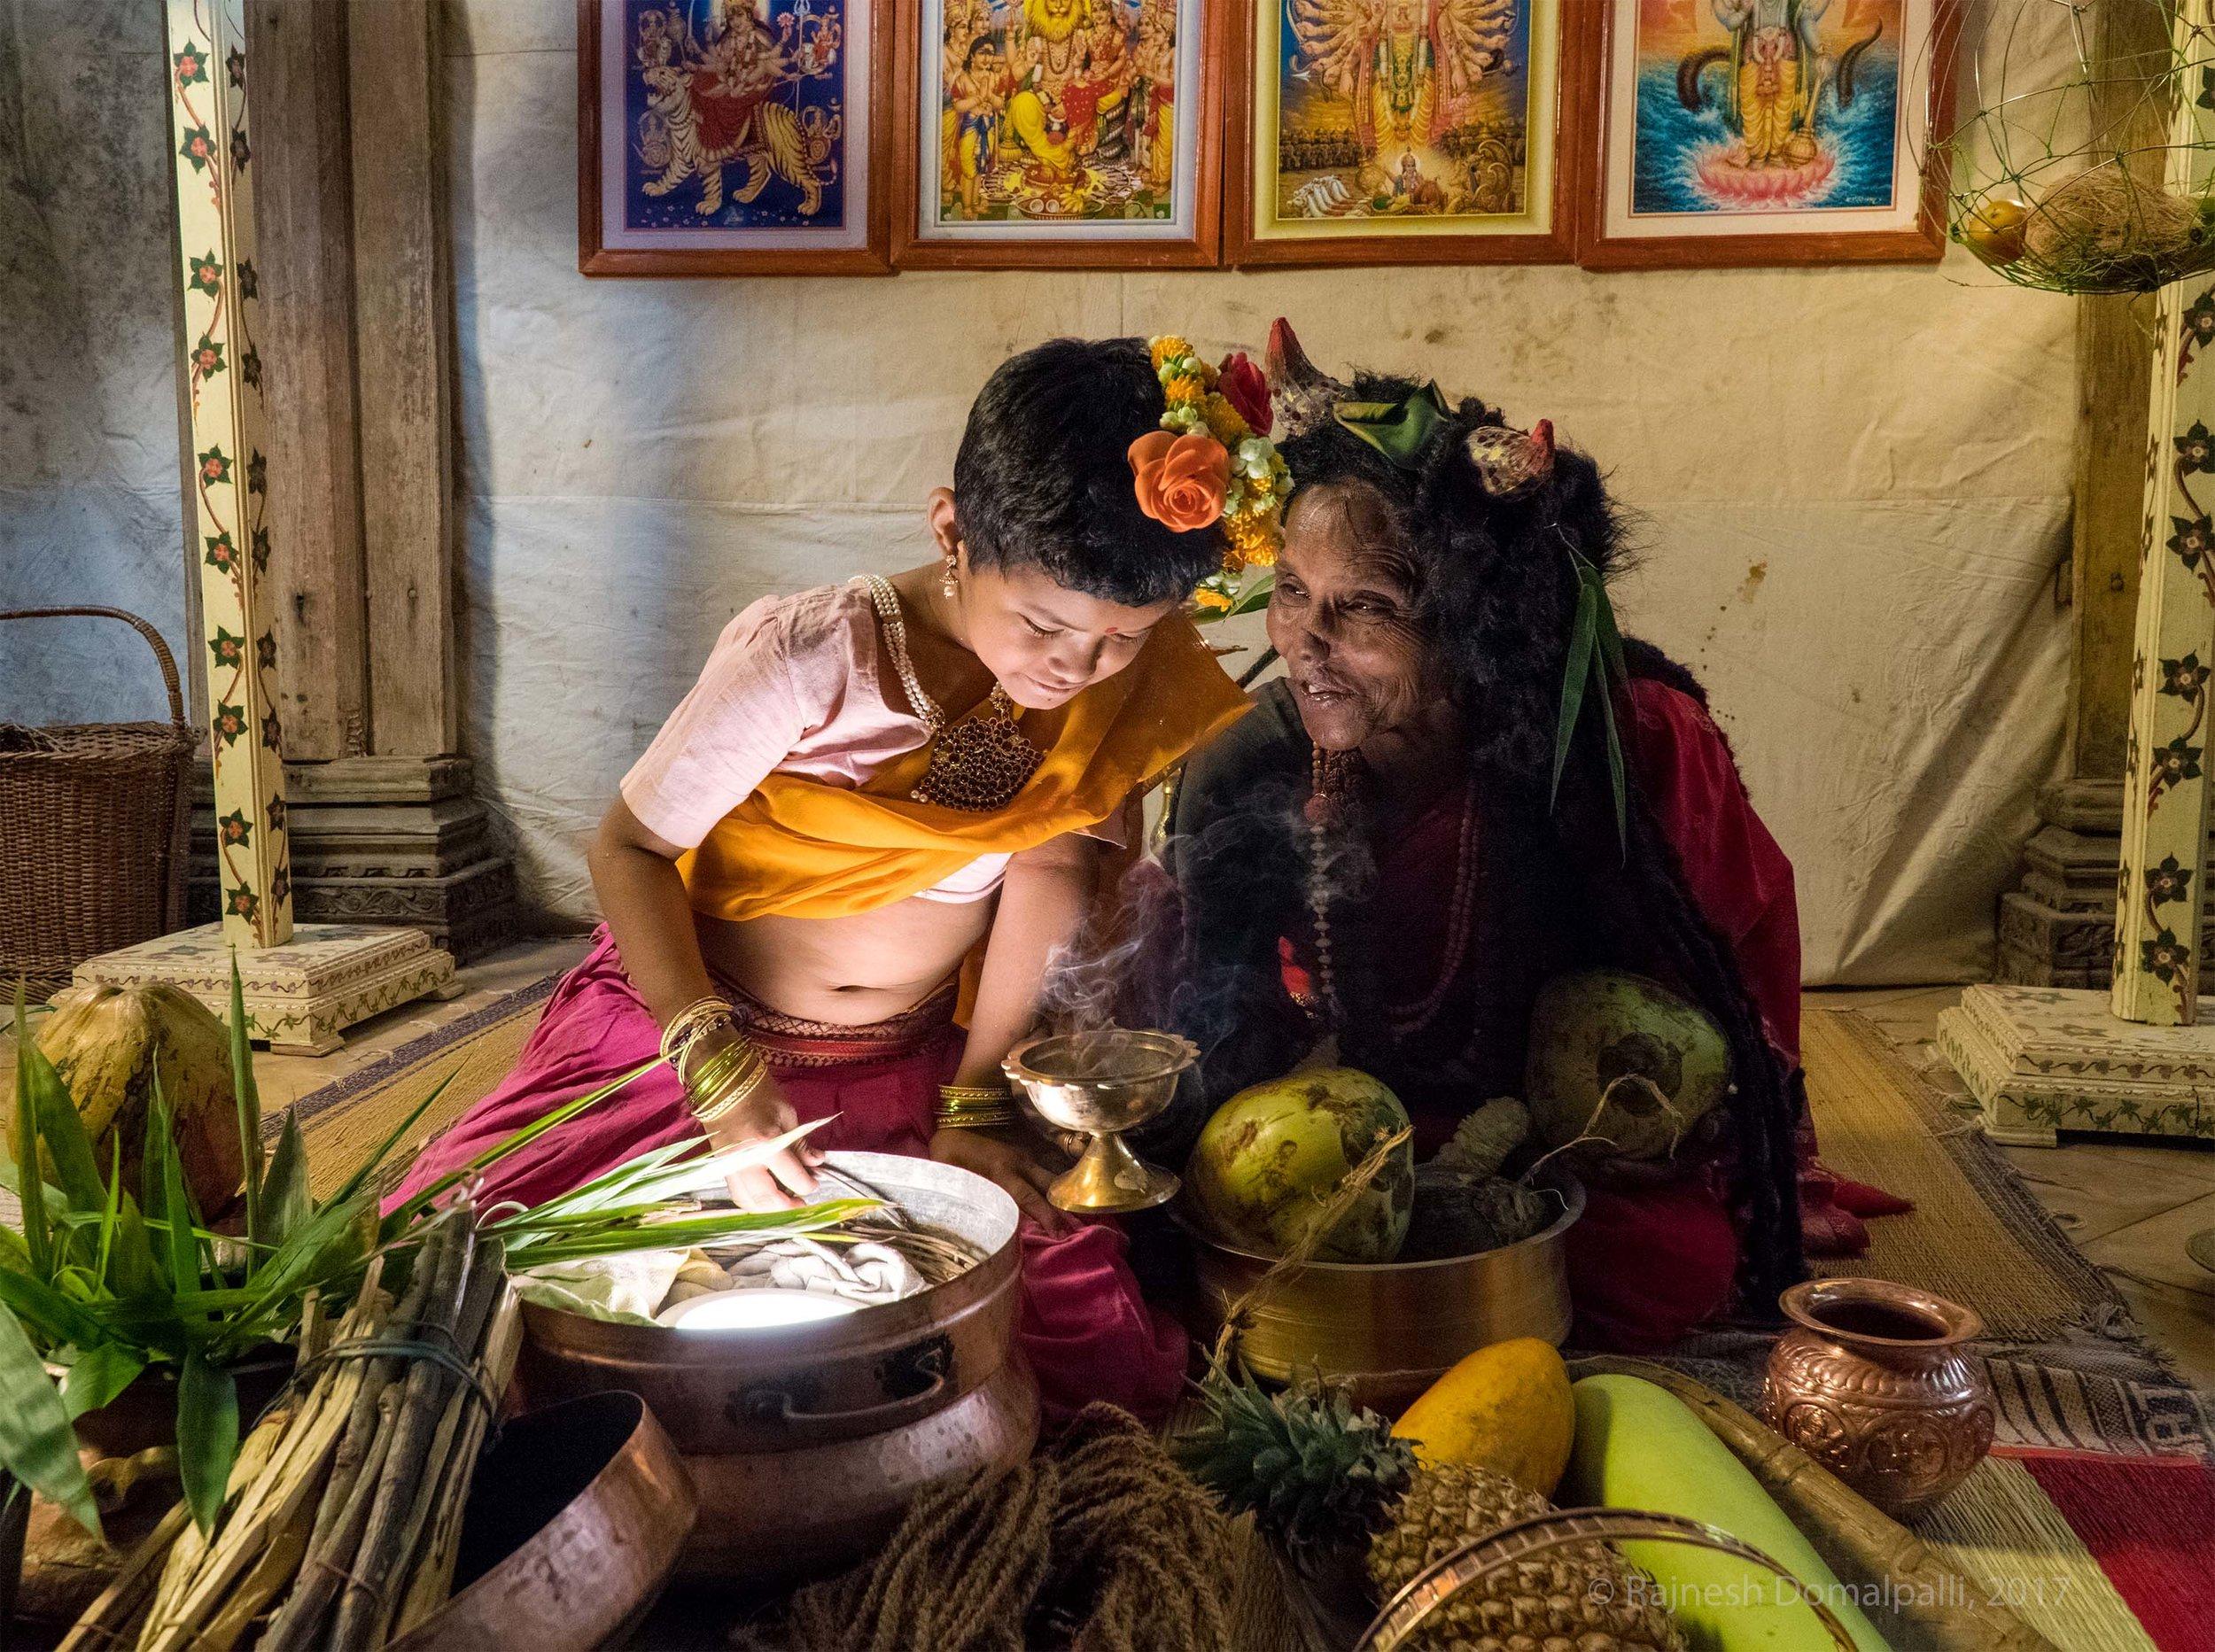 Mangi and Sarga examine Magical Eggs